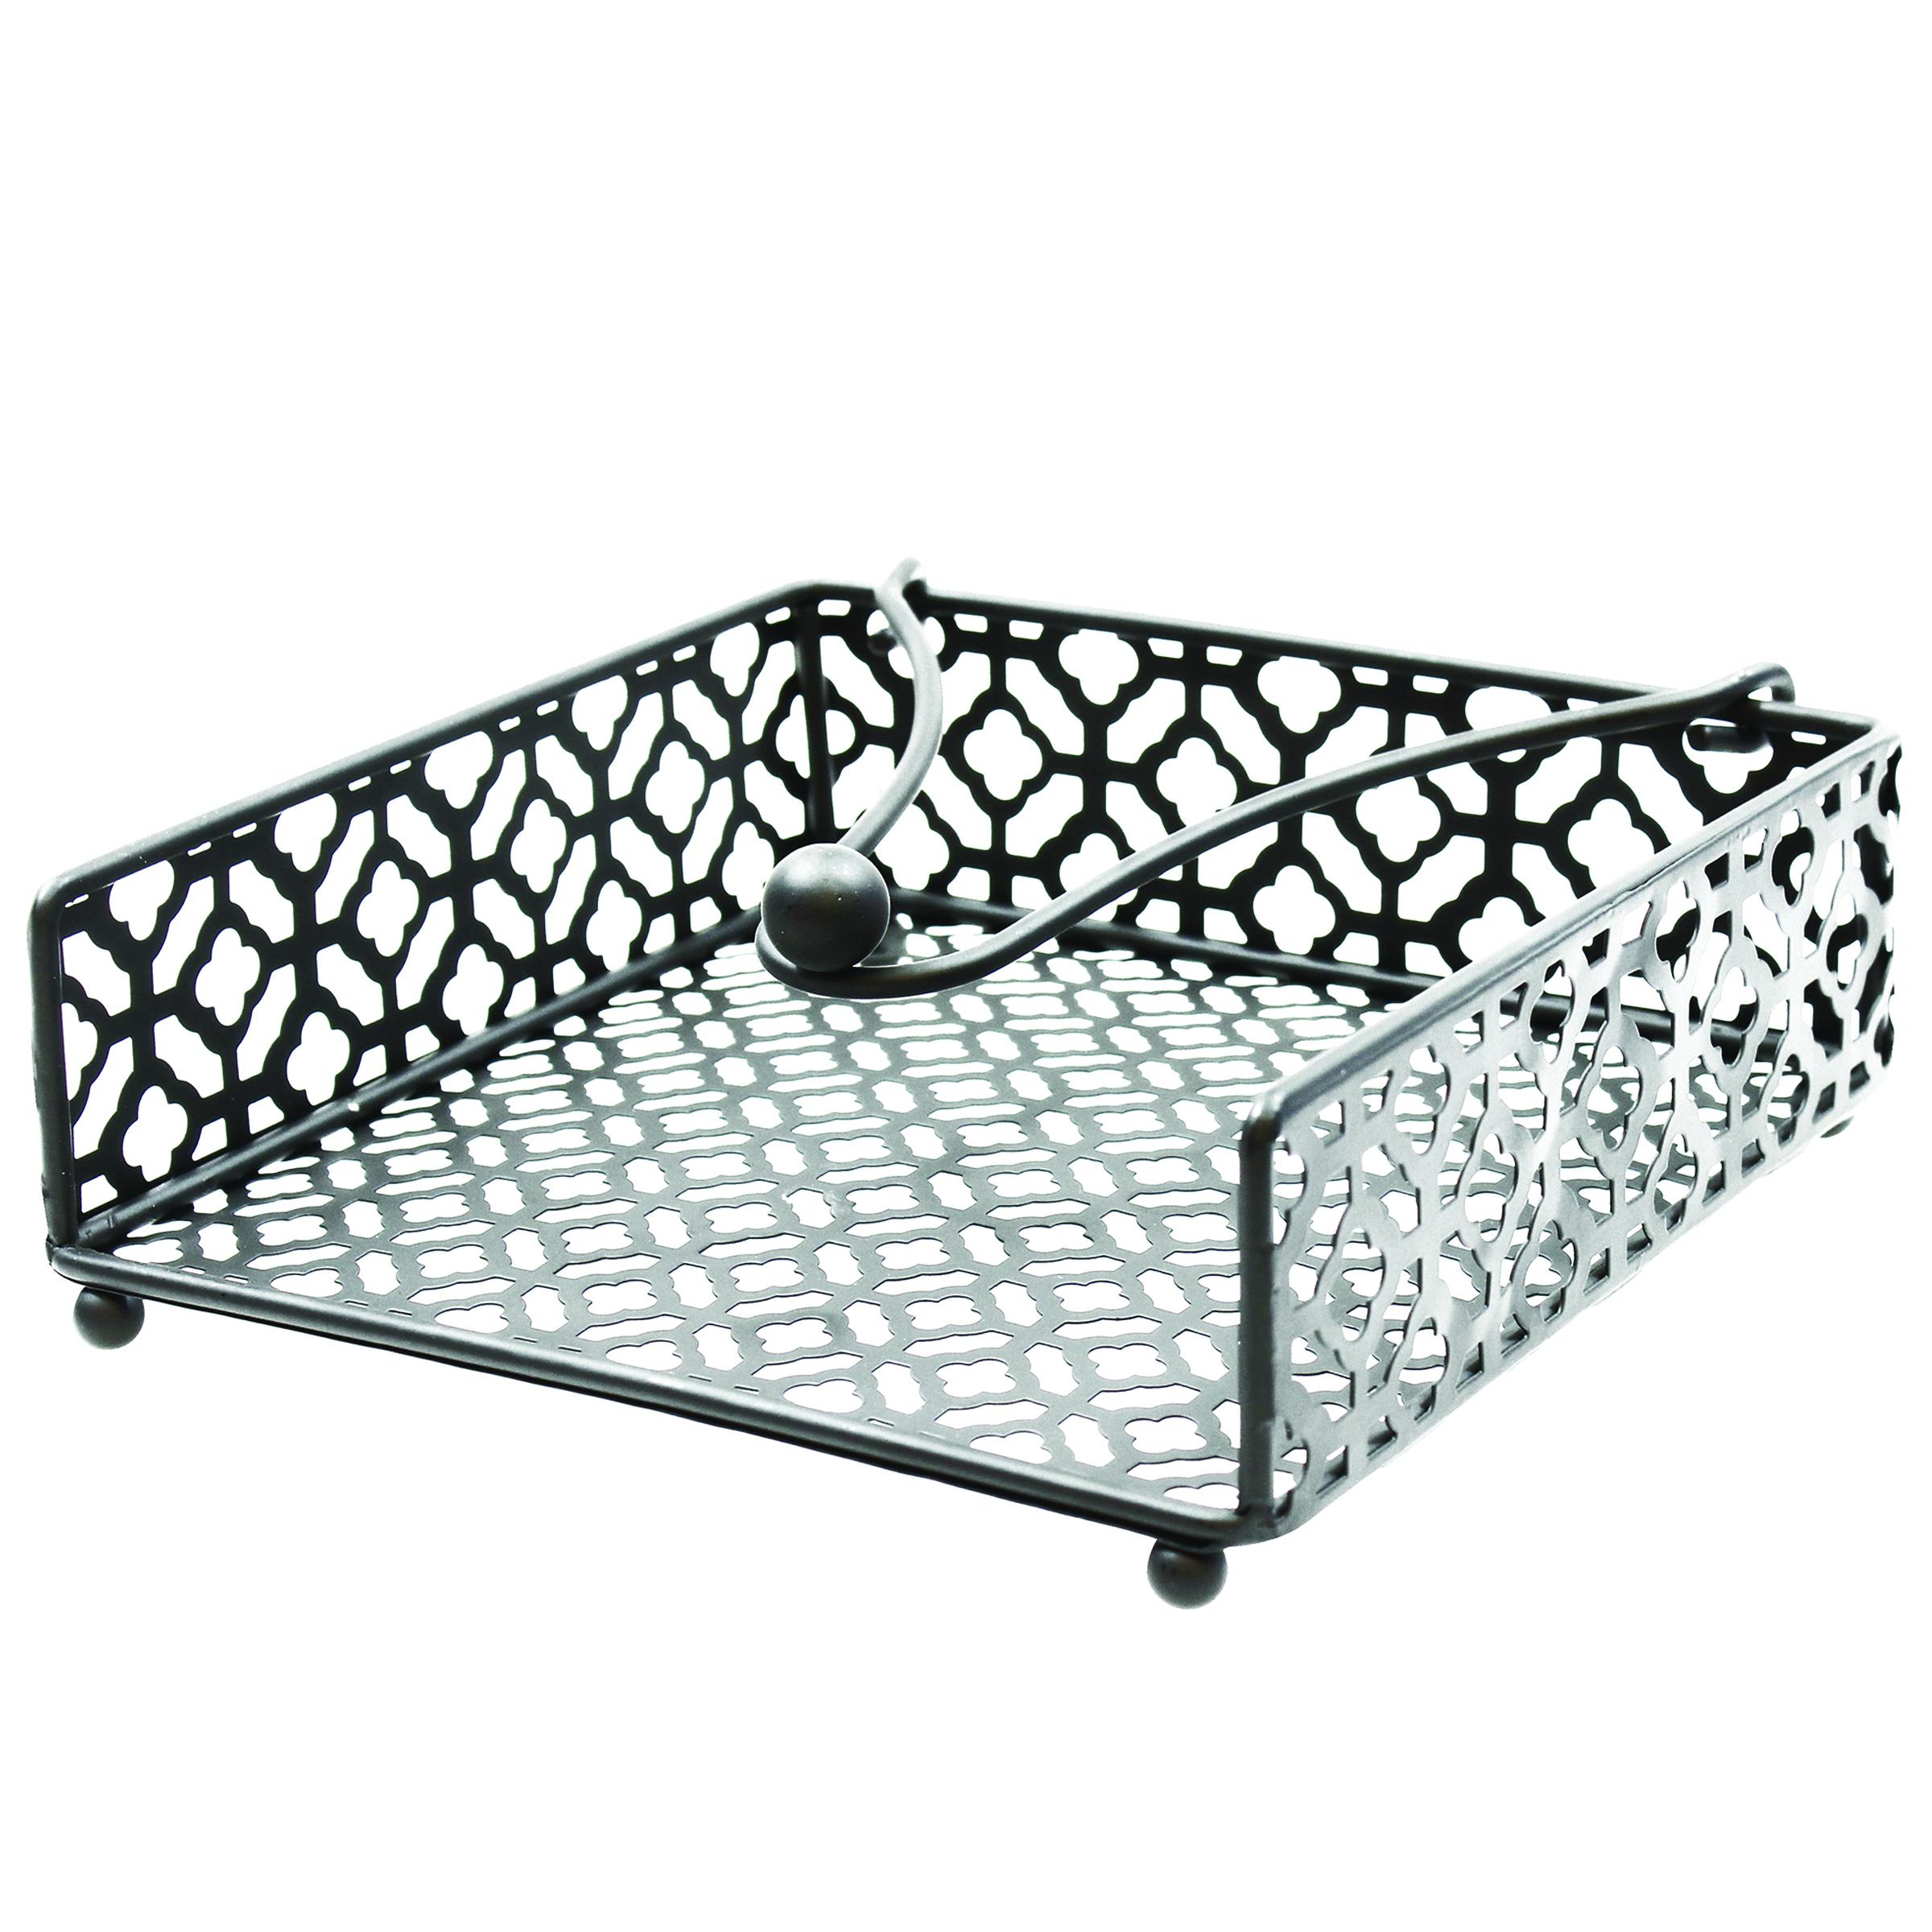 TableCraft Products HNH772BK tabletop accessories (caddies,